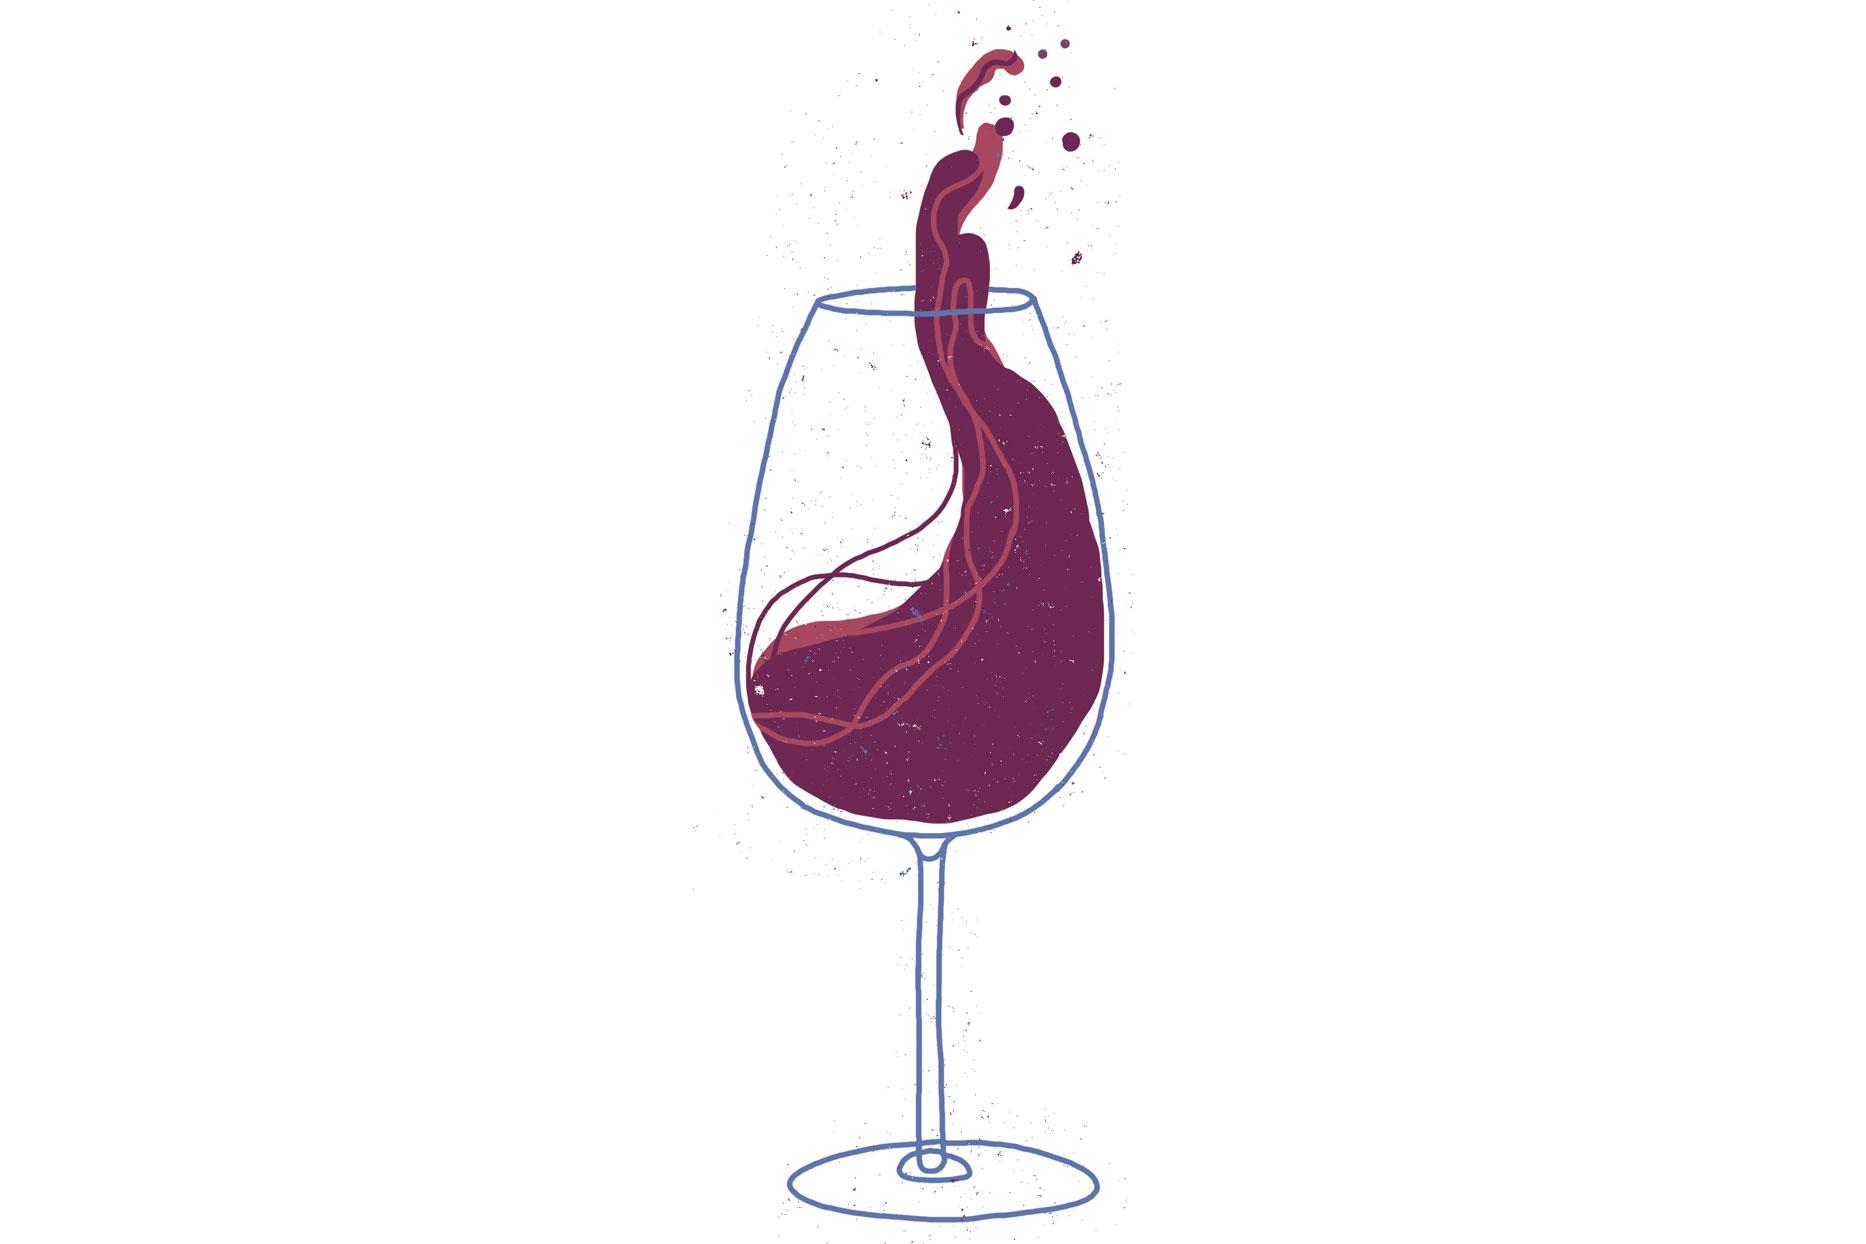 wine splashing up in wine glass illustration